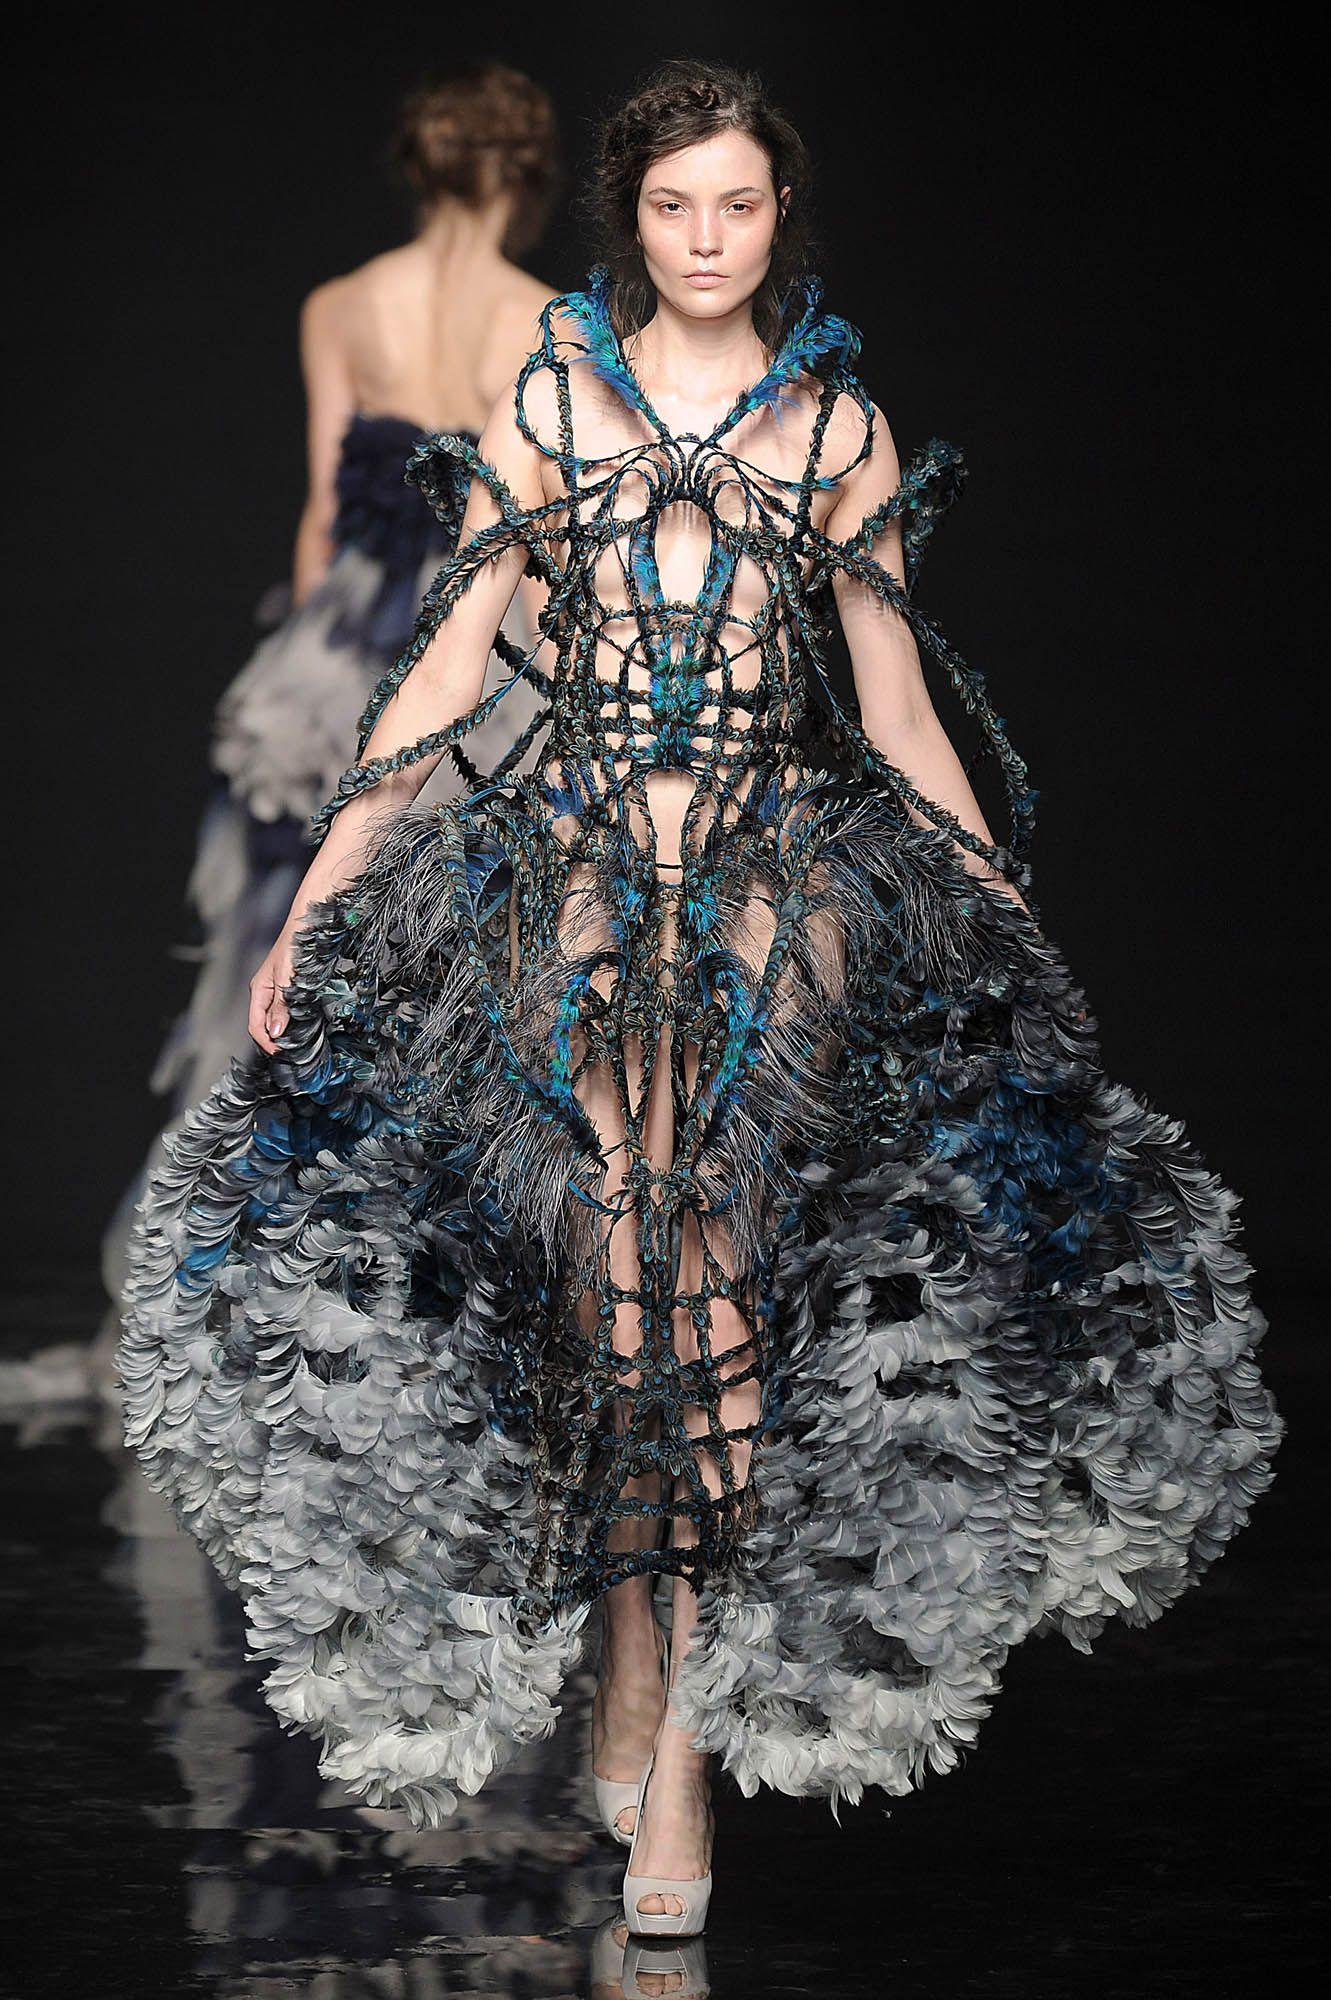 1000 images about avant garde fashion on pinterest avant garde fashion designers and fashion avant garde meets arabic